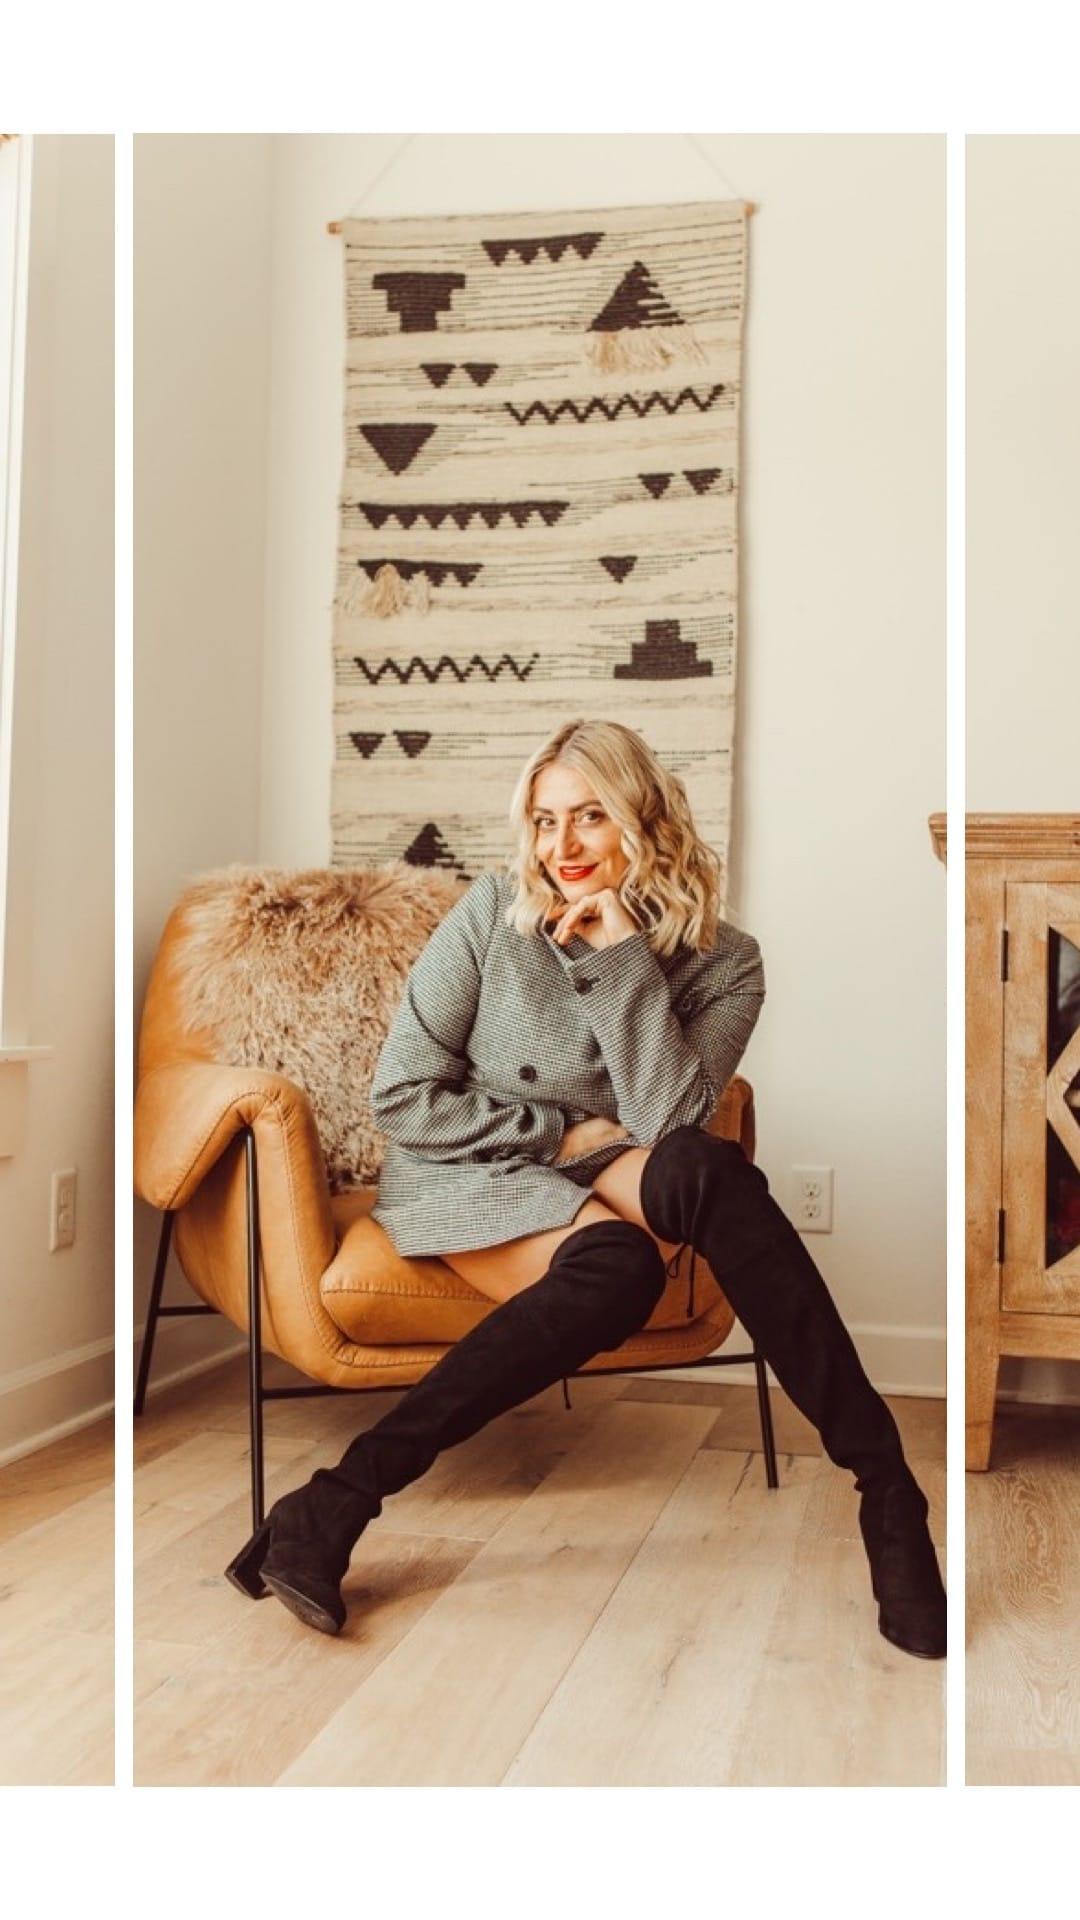 stylish woman on chair